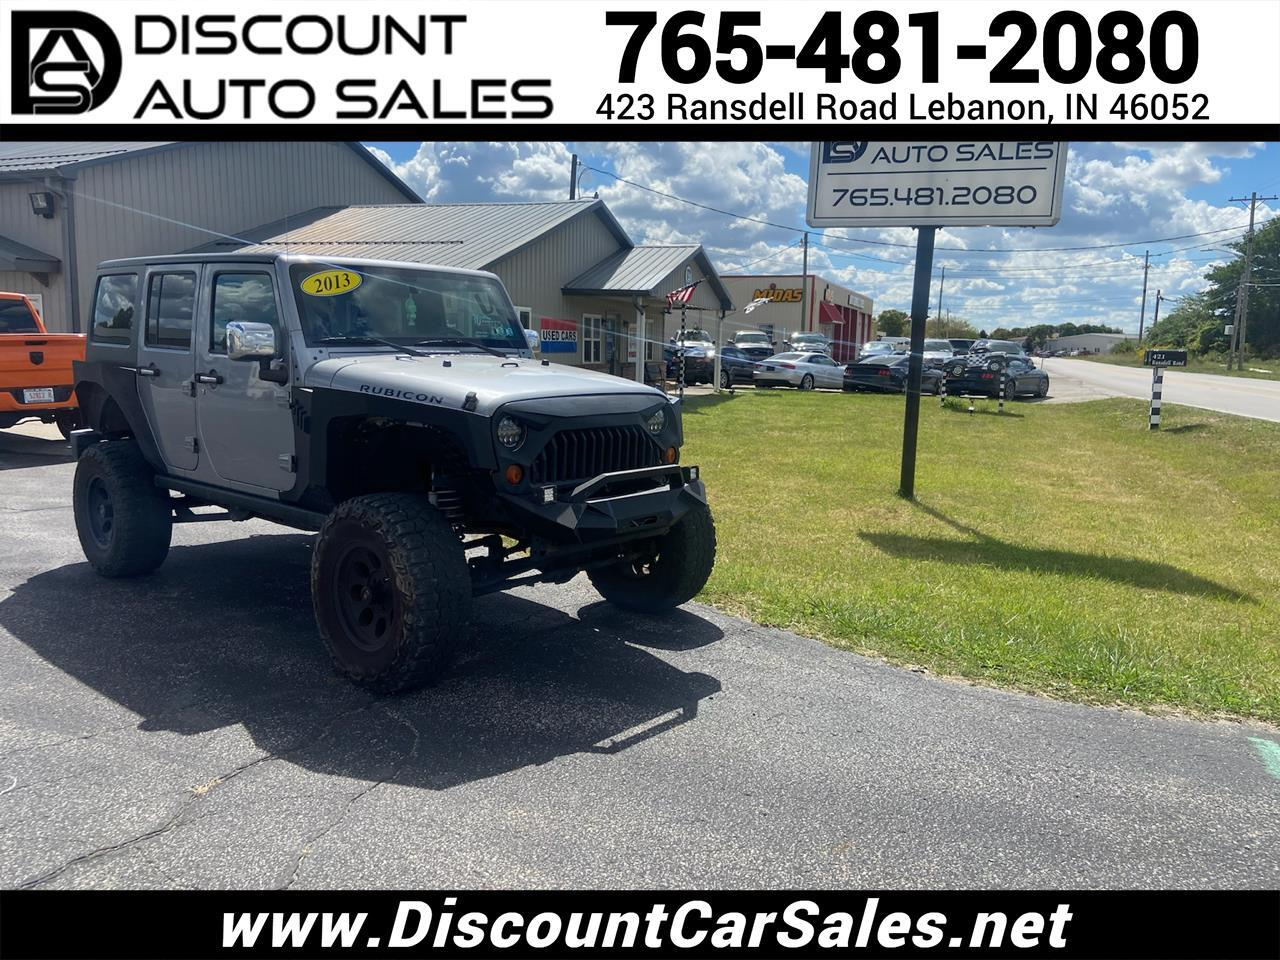 Jeep Wrangler Unlimited Rubicon 4WD 2013